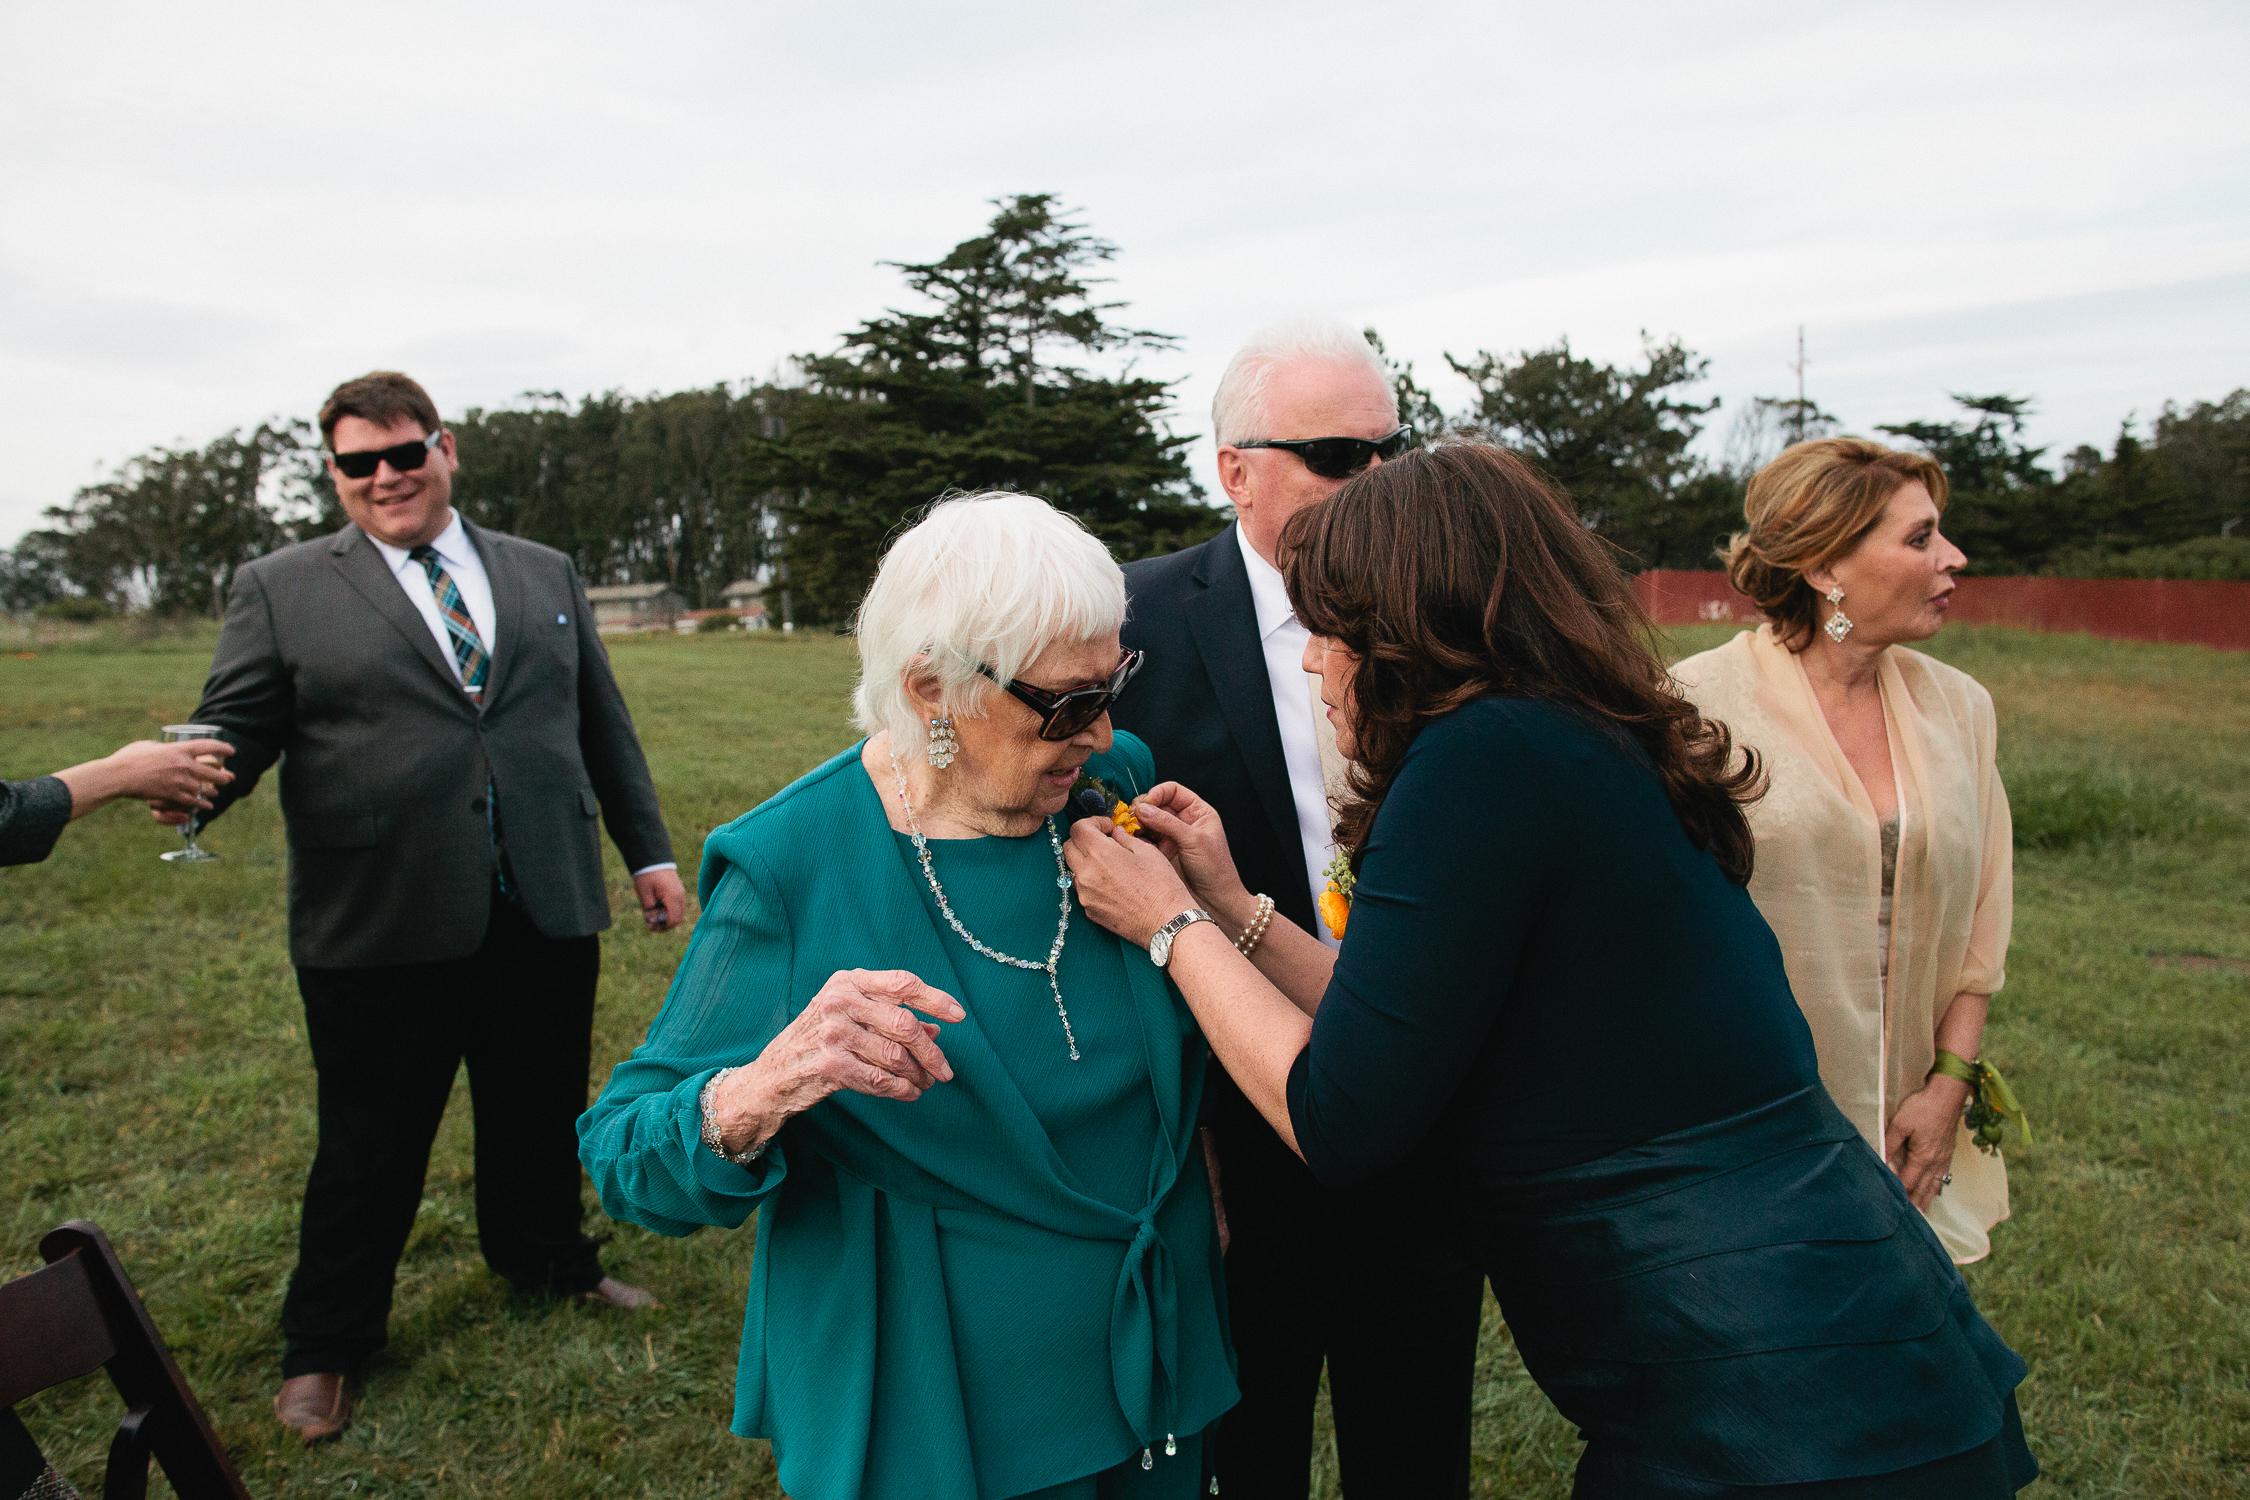 gretchen_Gause_San_Francisco_Presidio_Wedding_Photo_